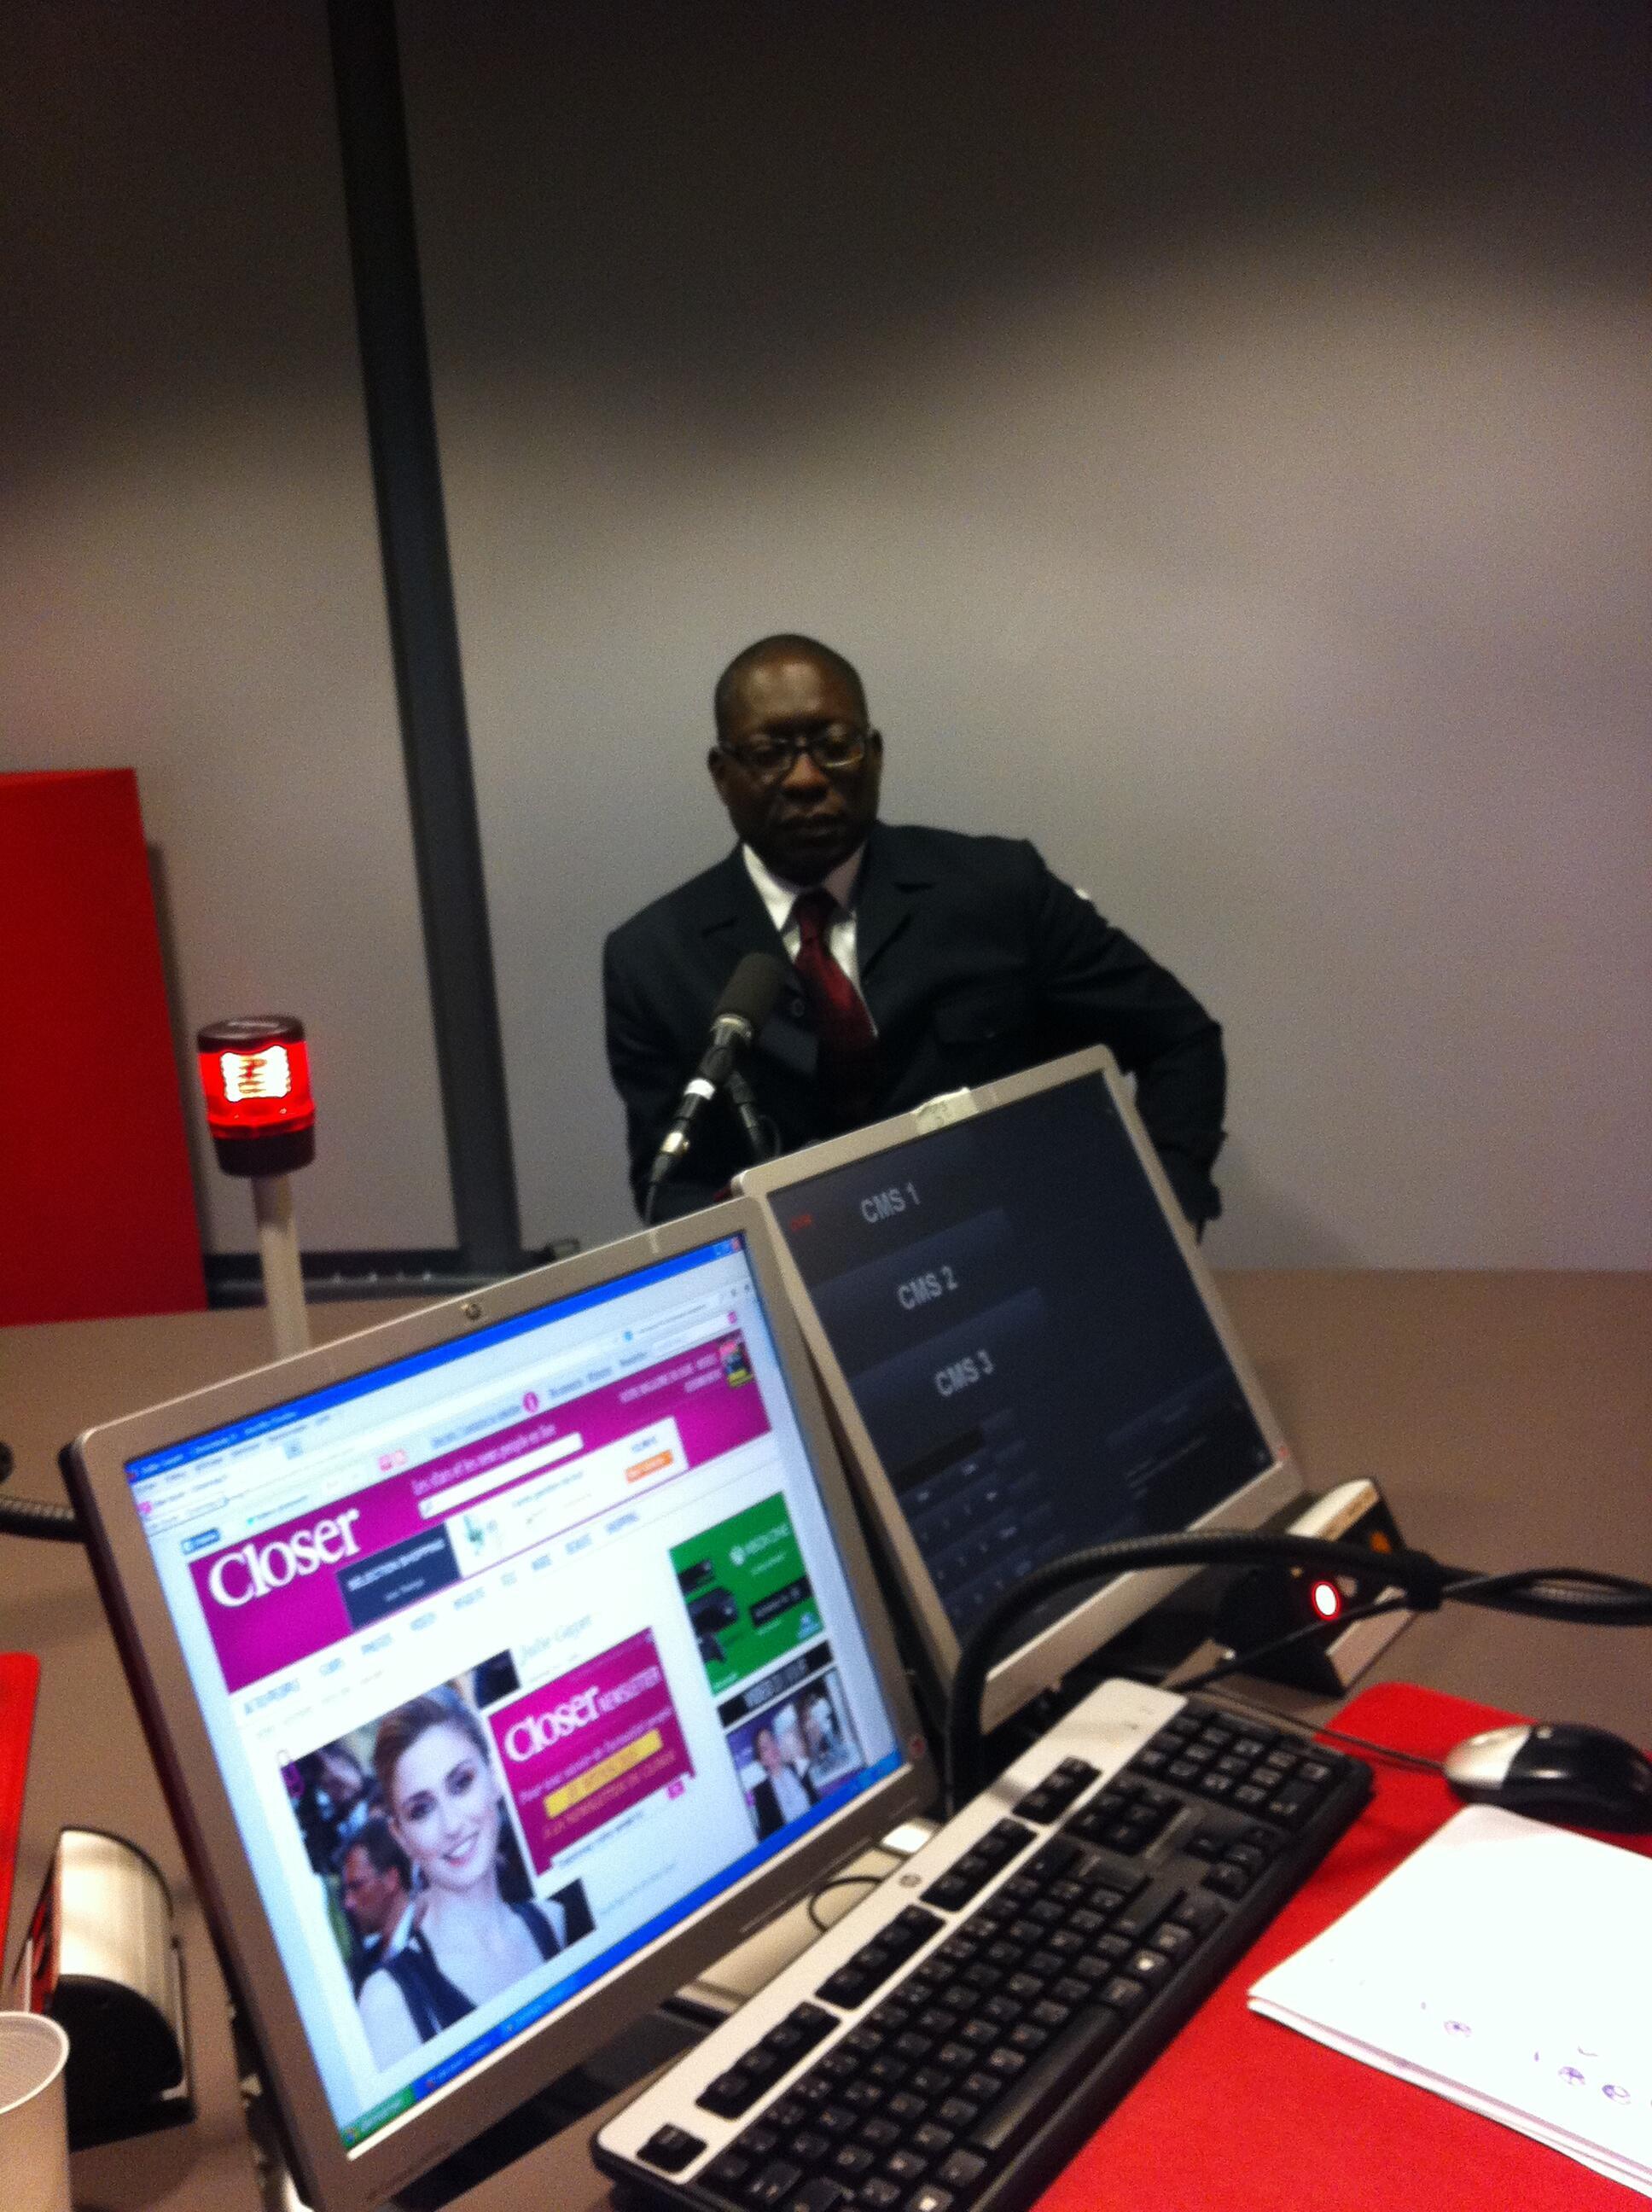 Paulo Gomes, economista guineense, candidato independente às presidenciais de 2014